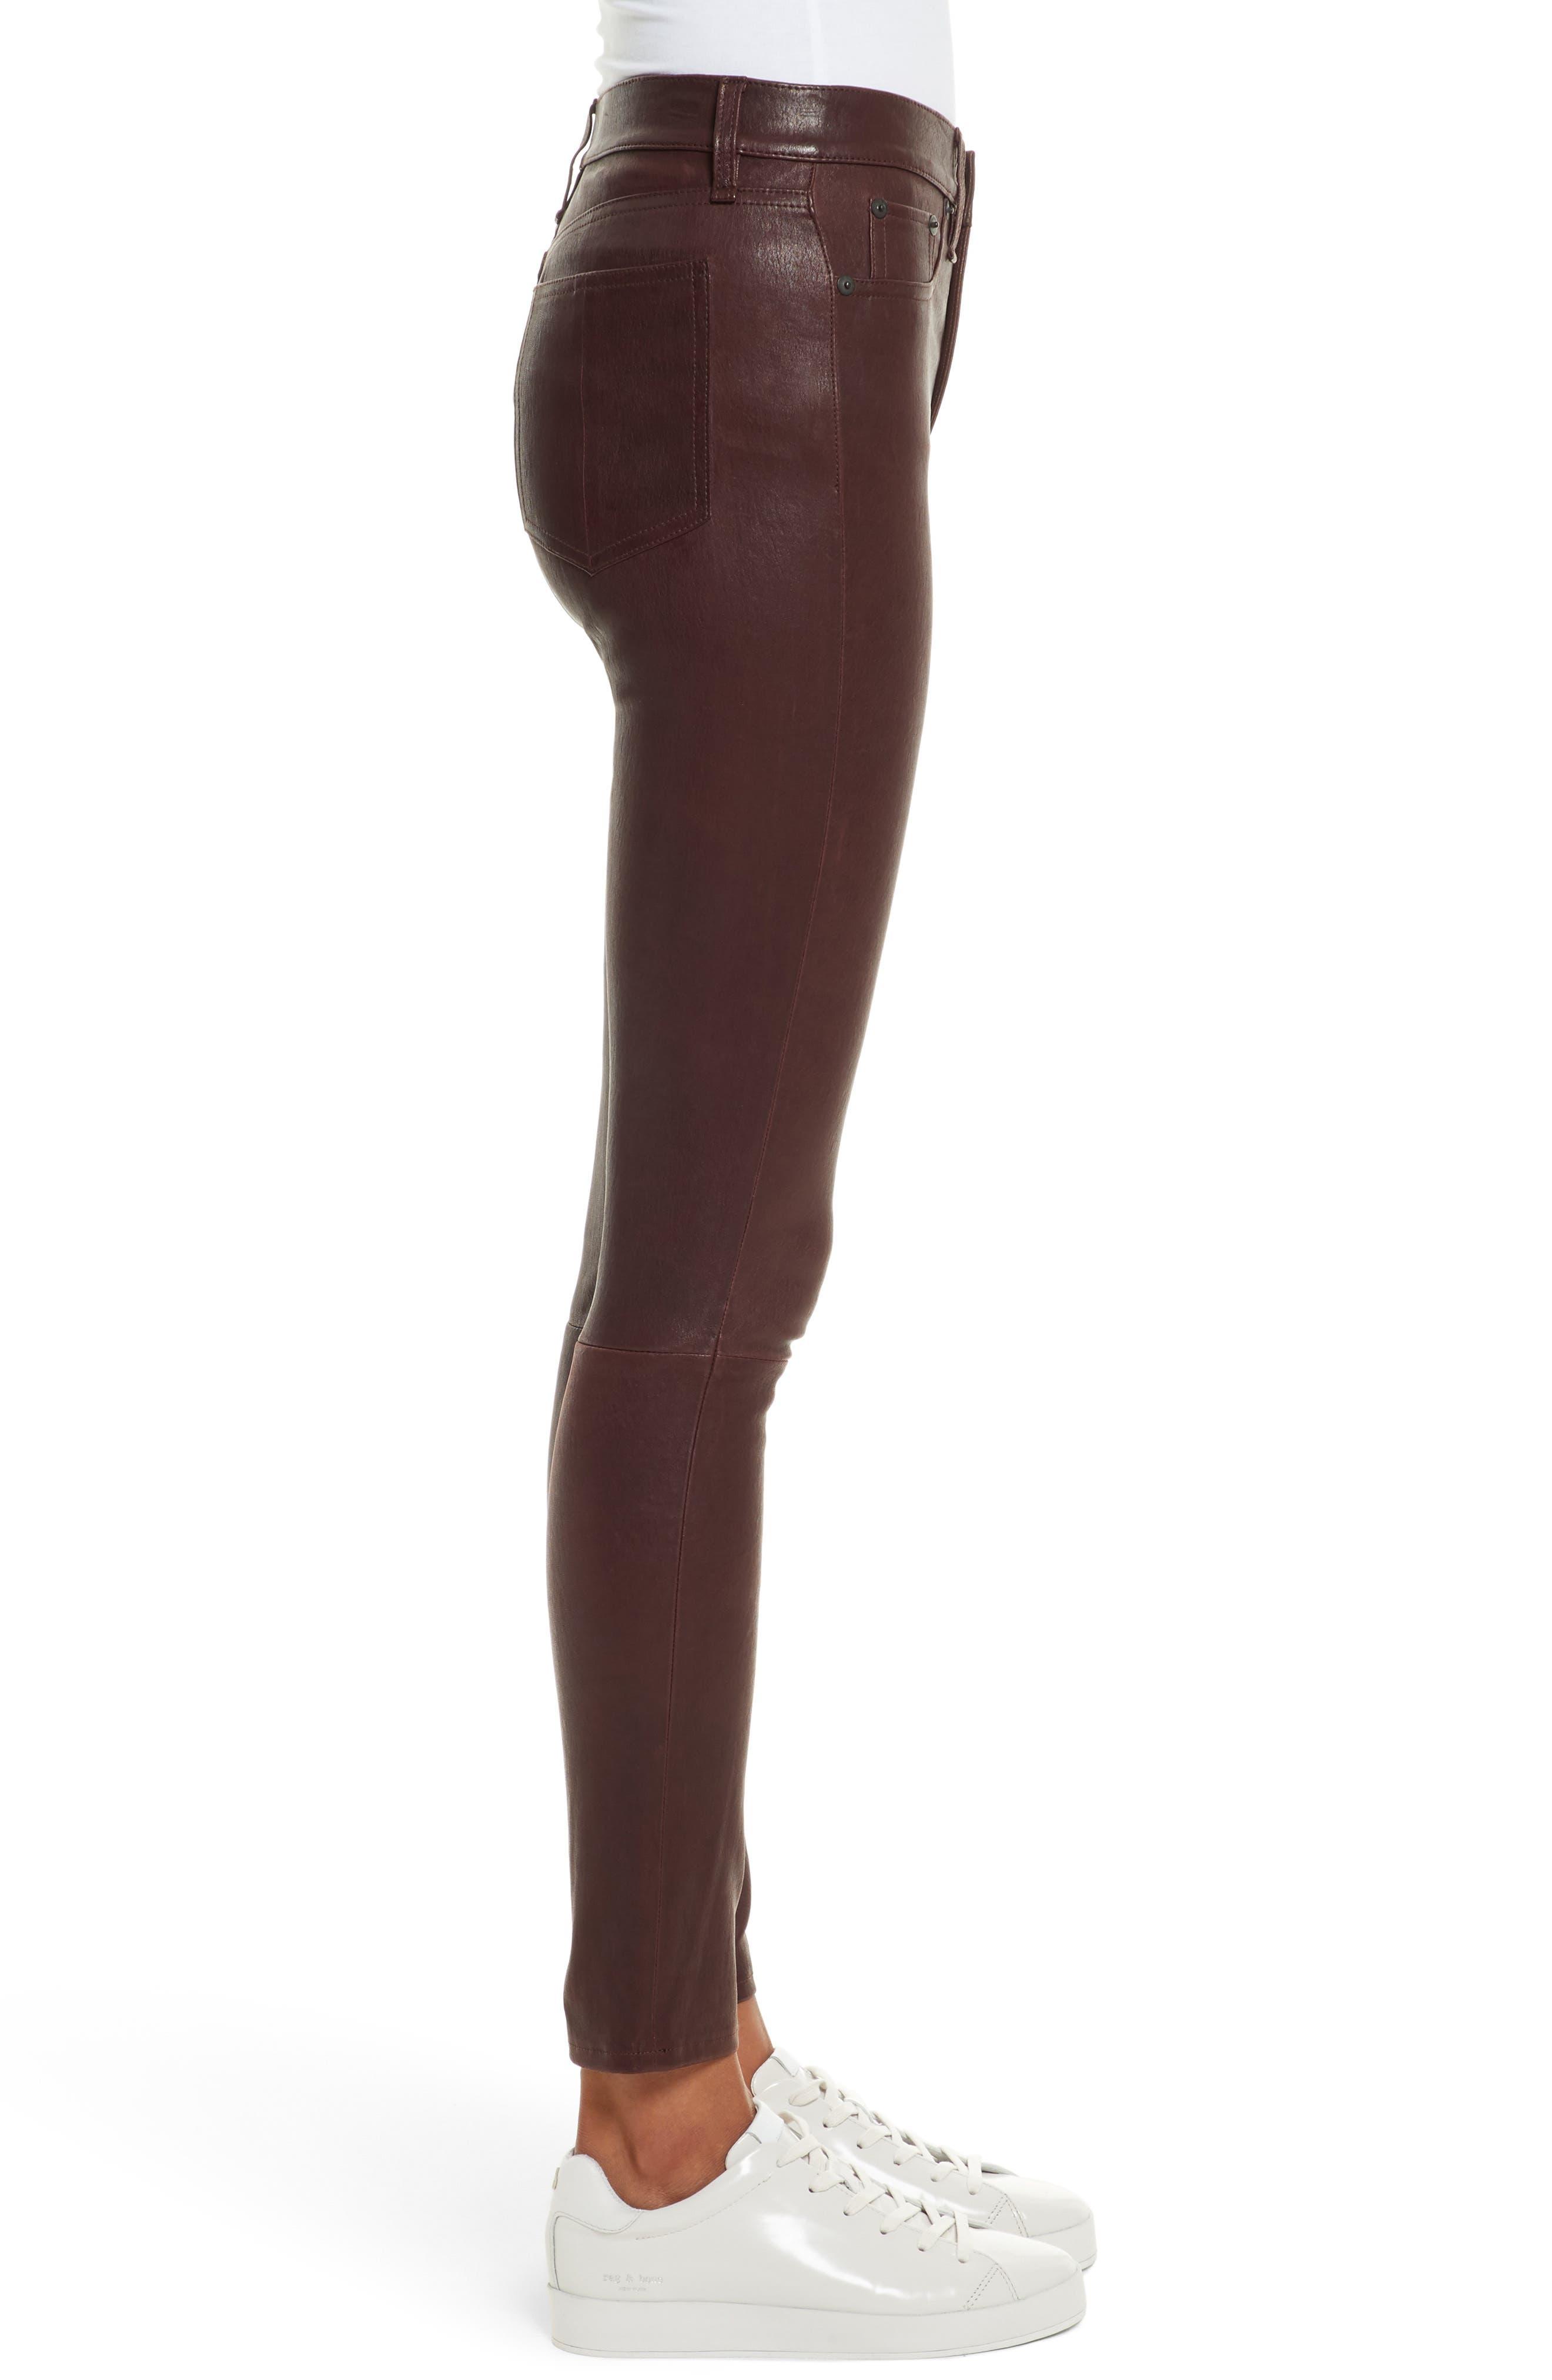 Lambskin Leather Pants,                             Alternate thumbnail 3, color,                             230